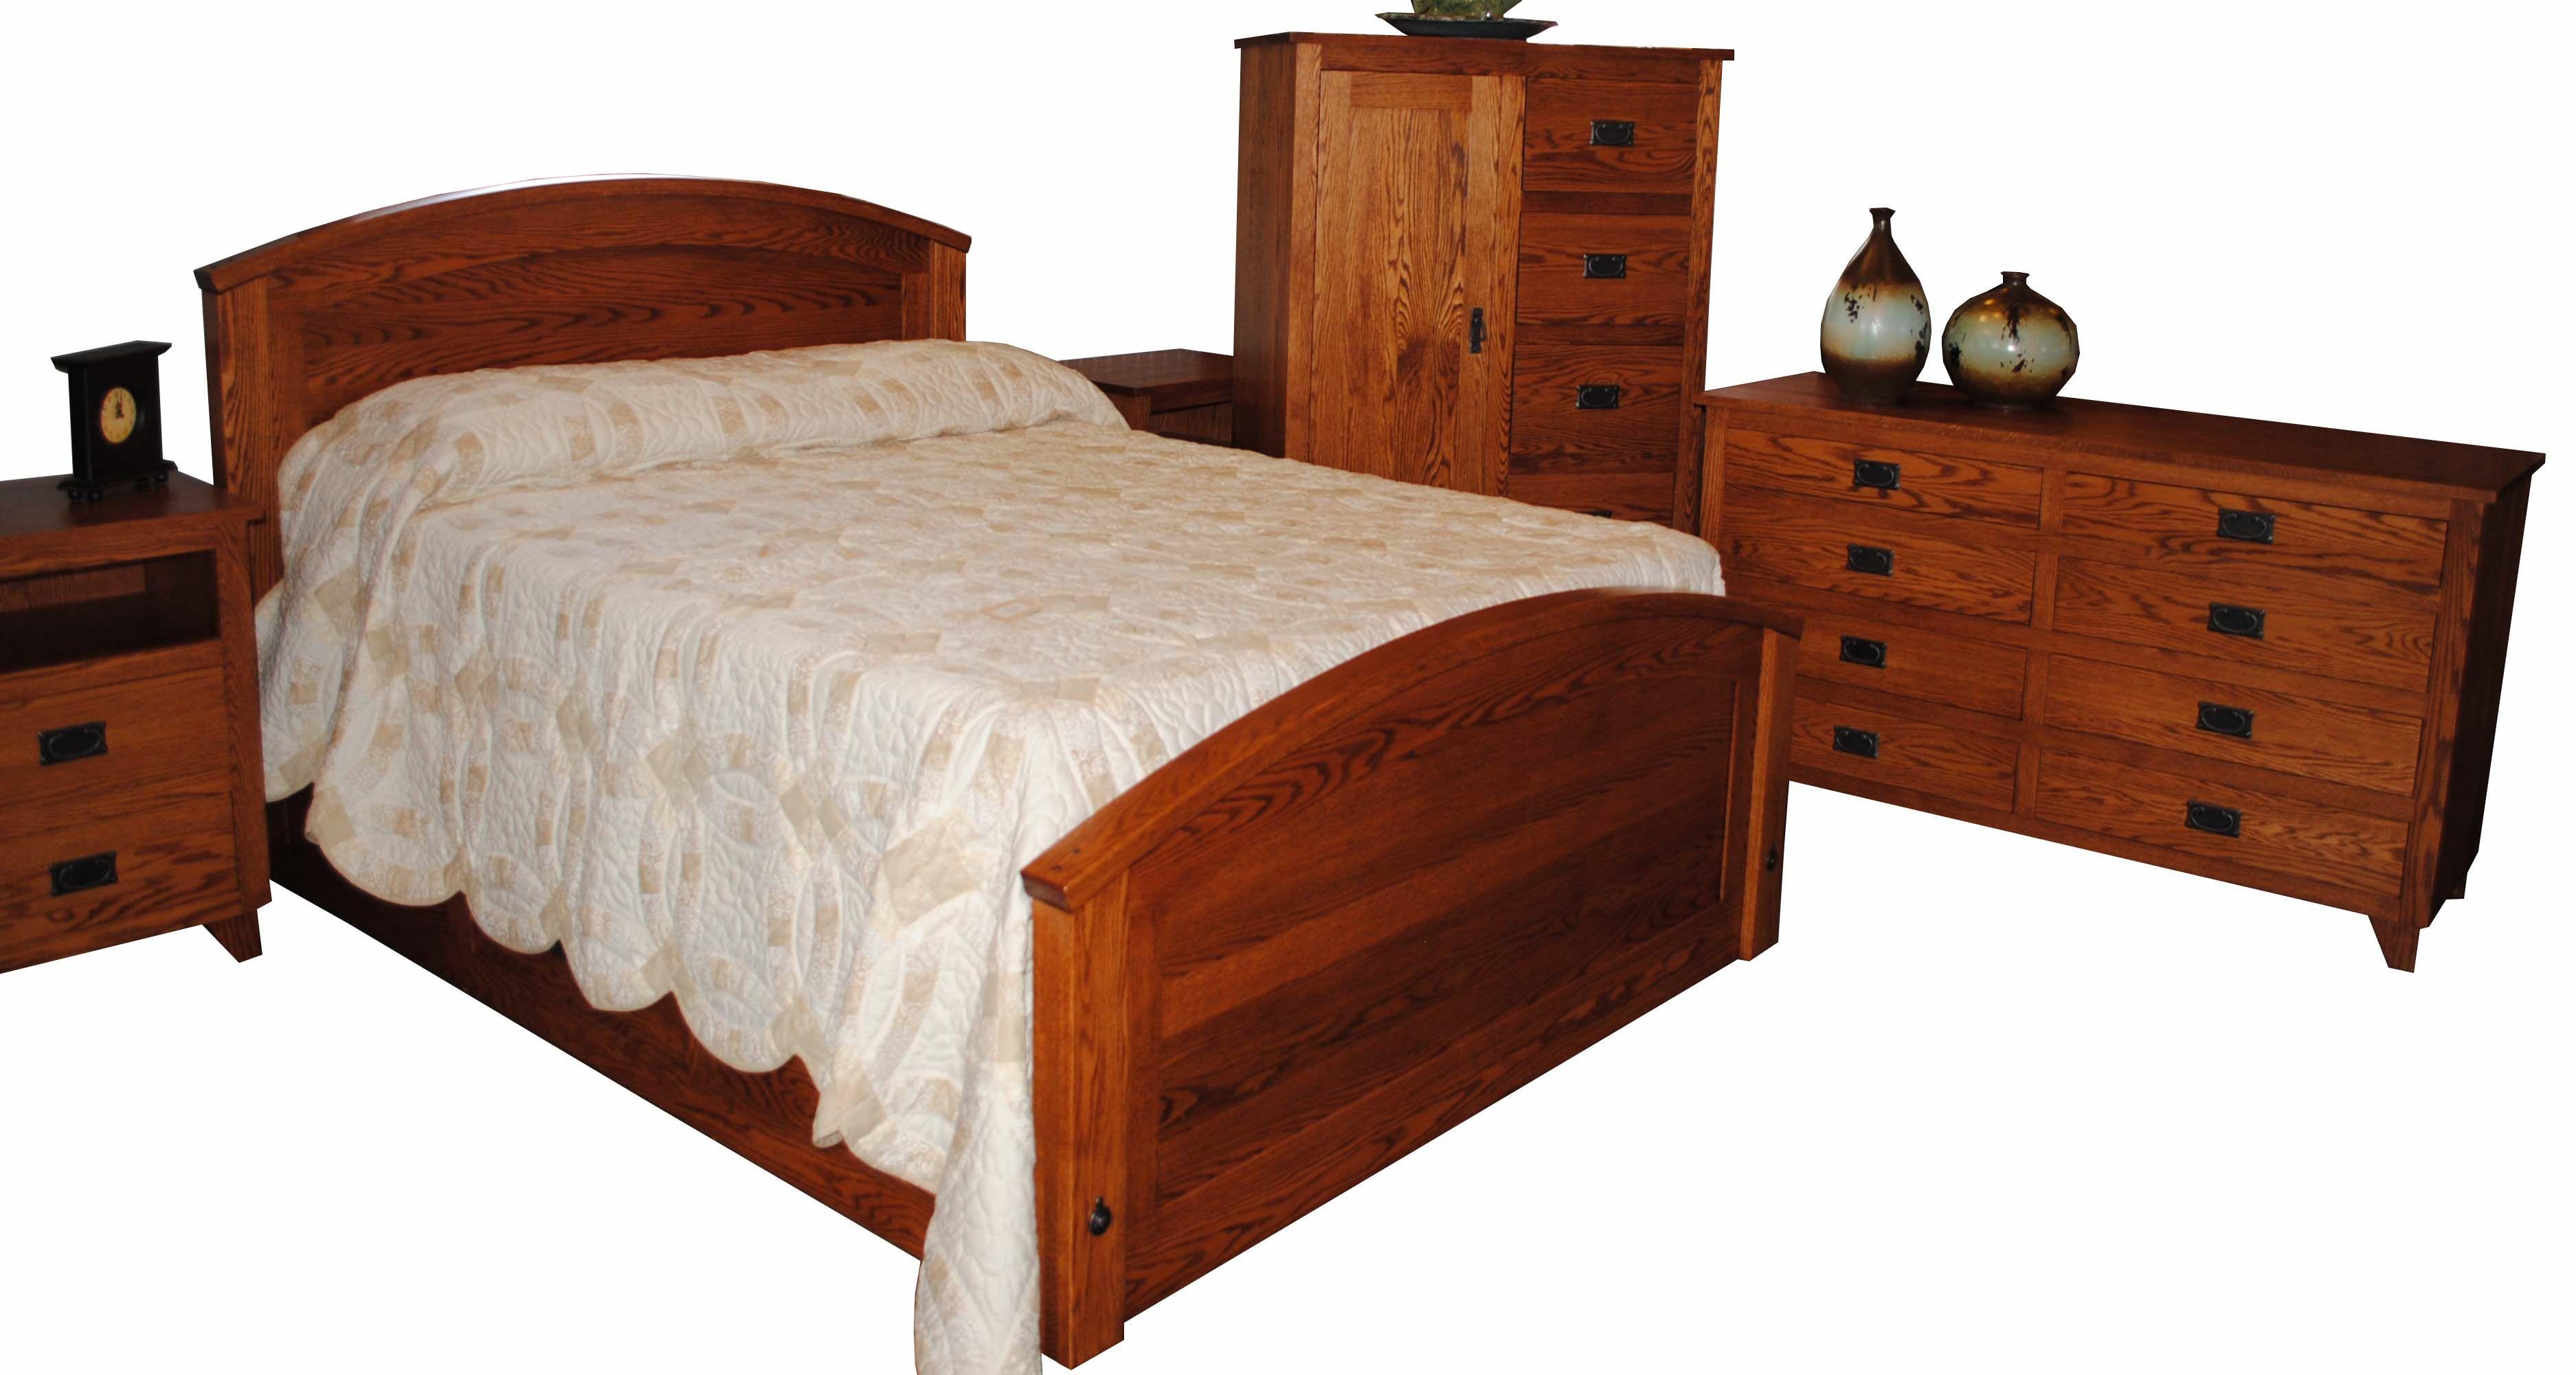 Custom Made Amish Furniture New London Mn Oak Bedroom Furniture Oak Bedroom Furniture Sets Black Bedroom Furniture Decor